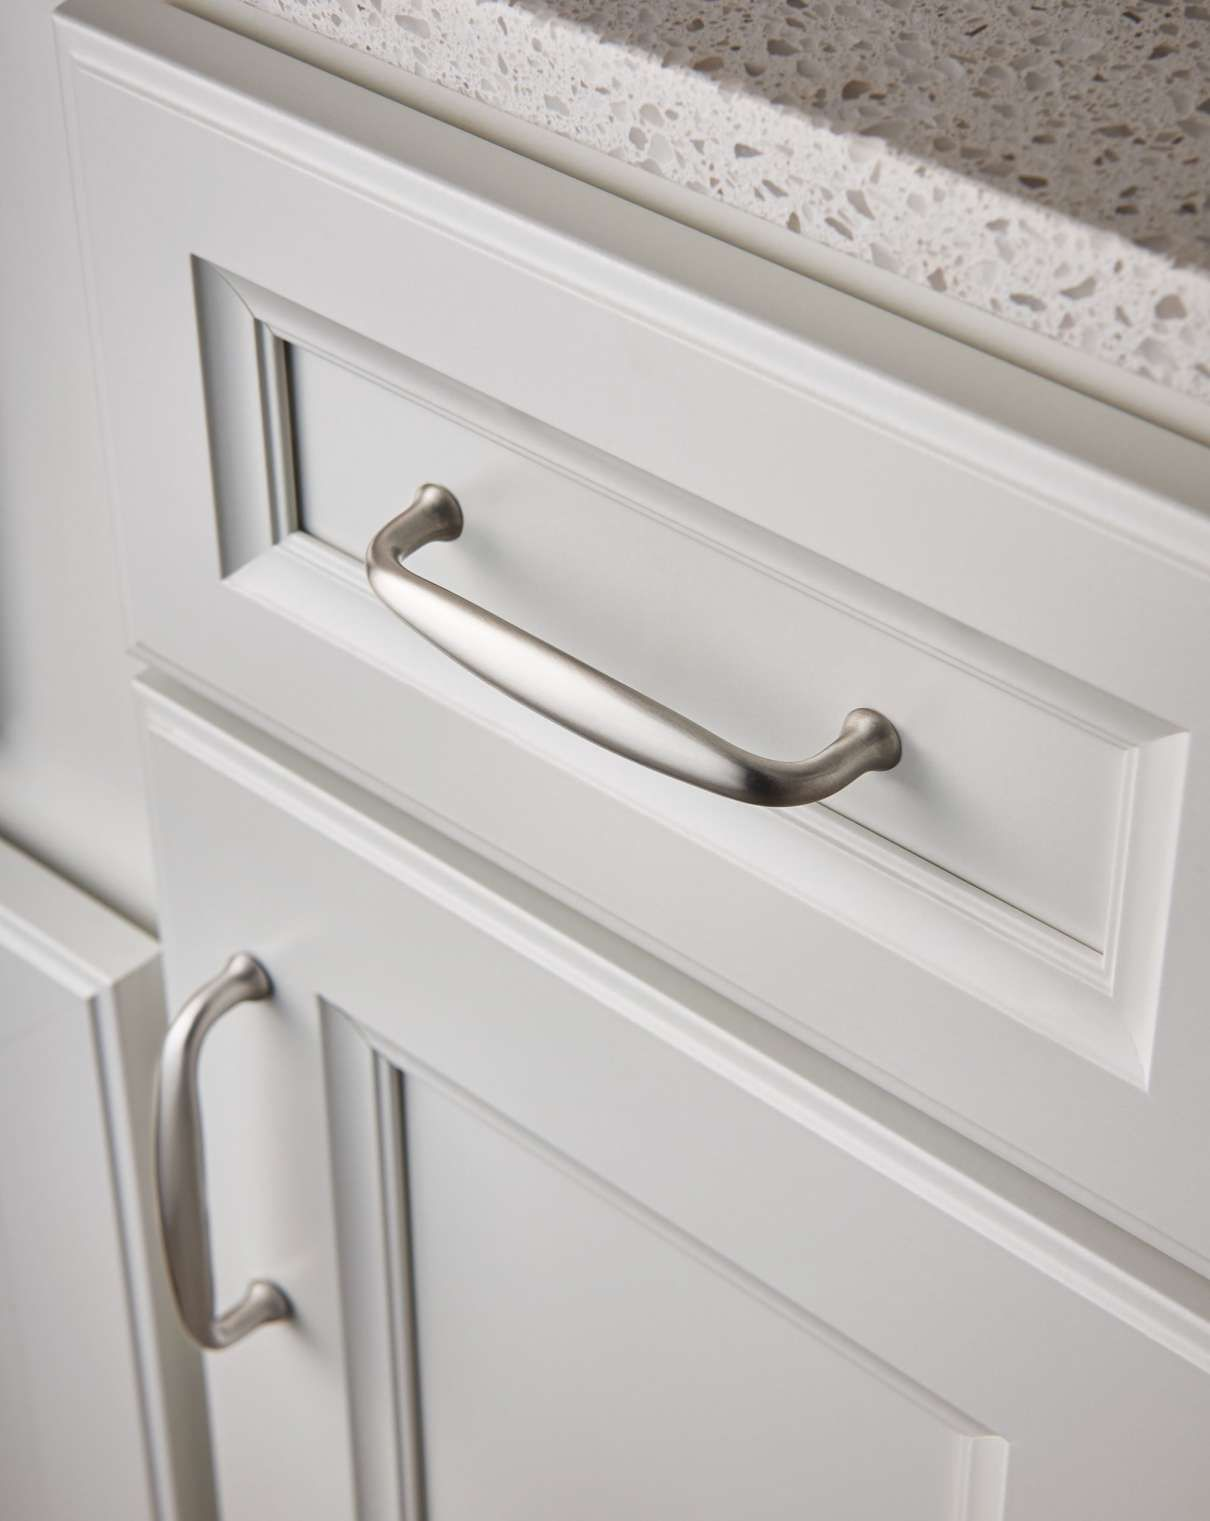 8 Romantic Kitchen Cabinet Handles Brushed Nickel Photos Brushed Cabinet Han In 2020 Kitchen Cabinet Handles Cabinet Hardware Brushed Nickel Kitchen Cabinets Hinges